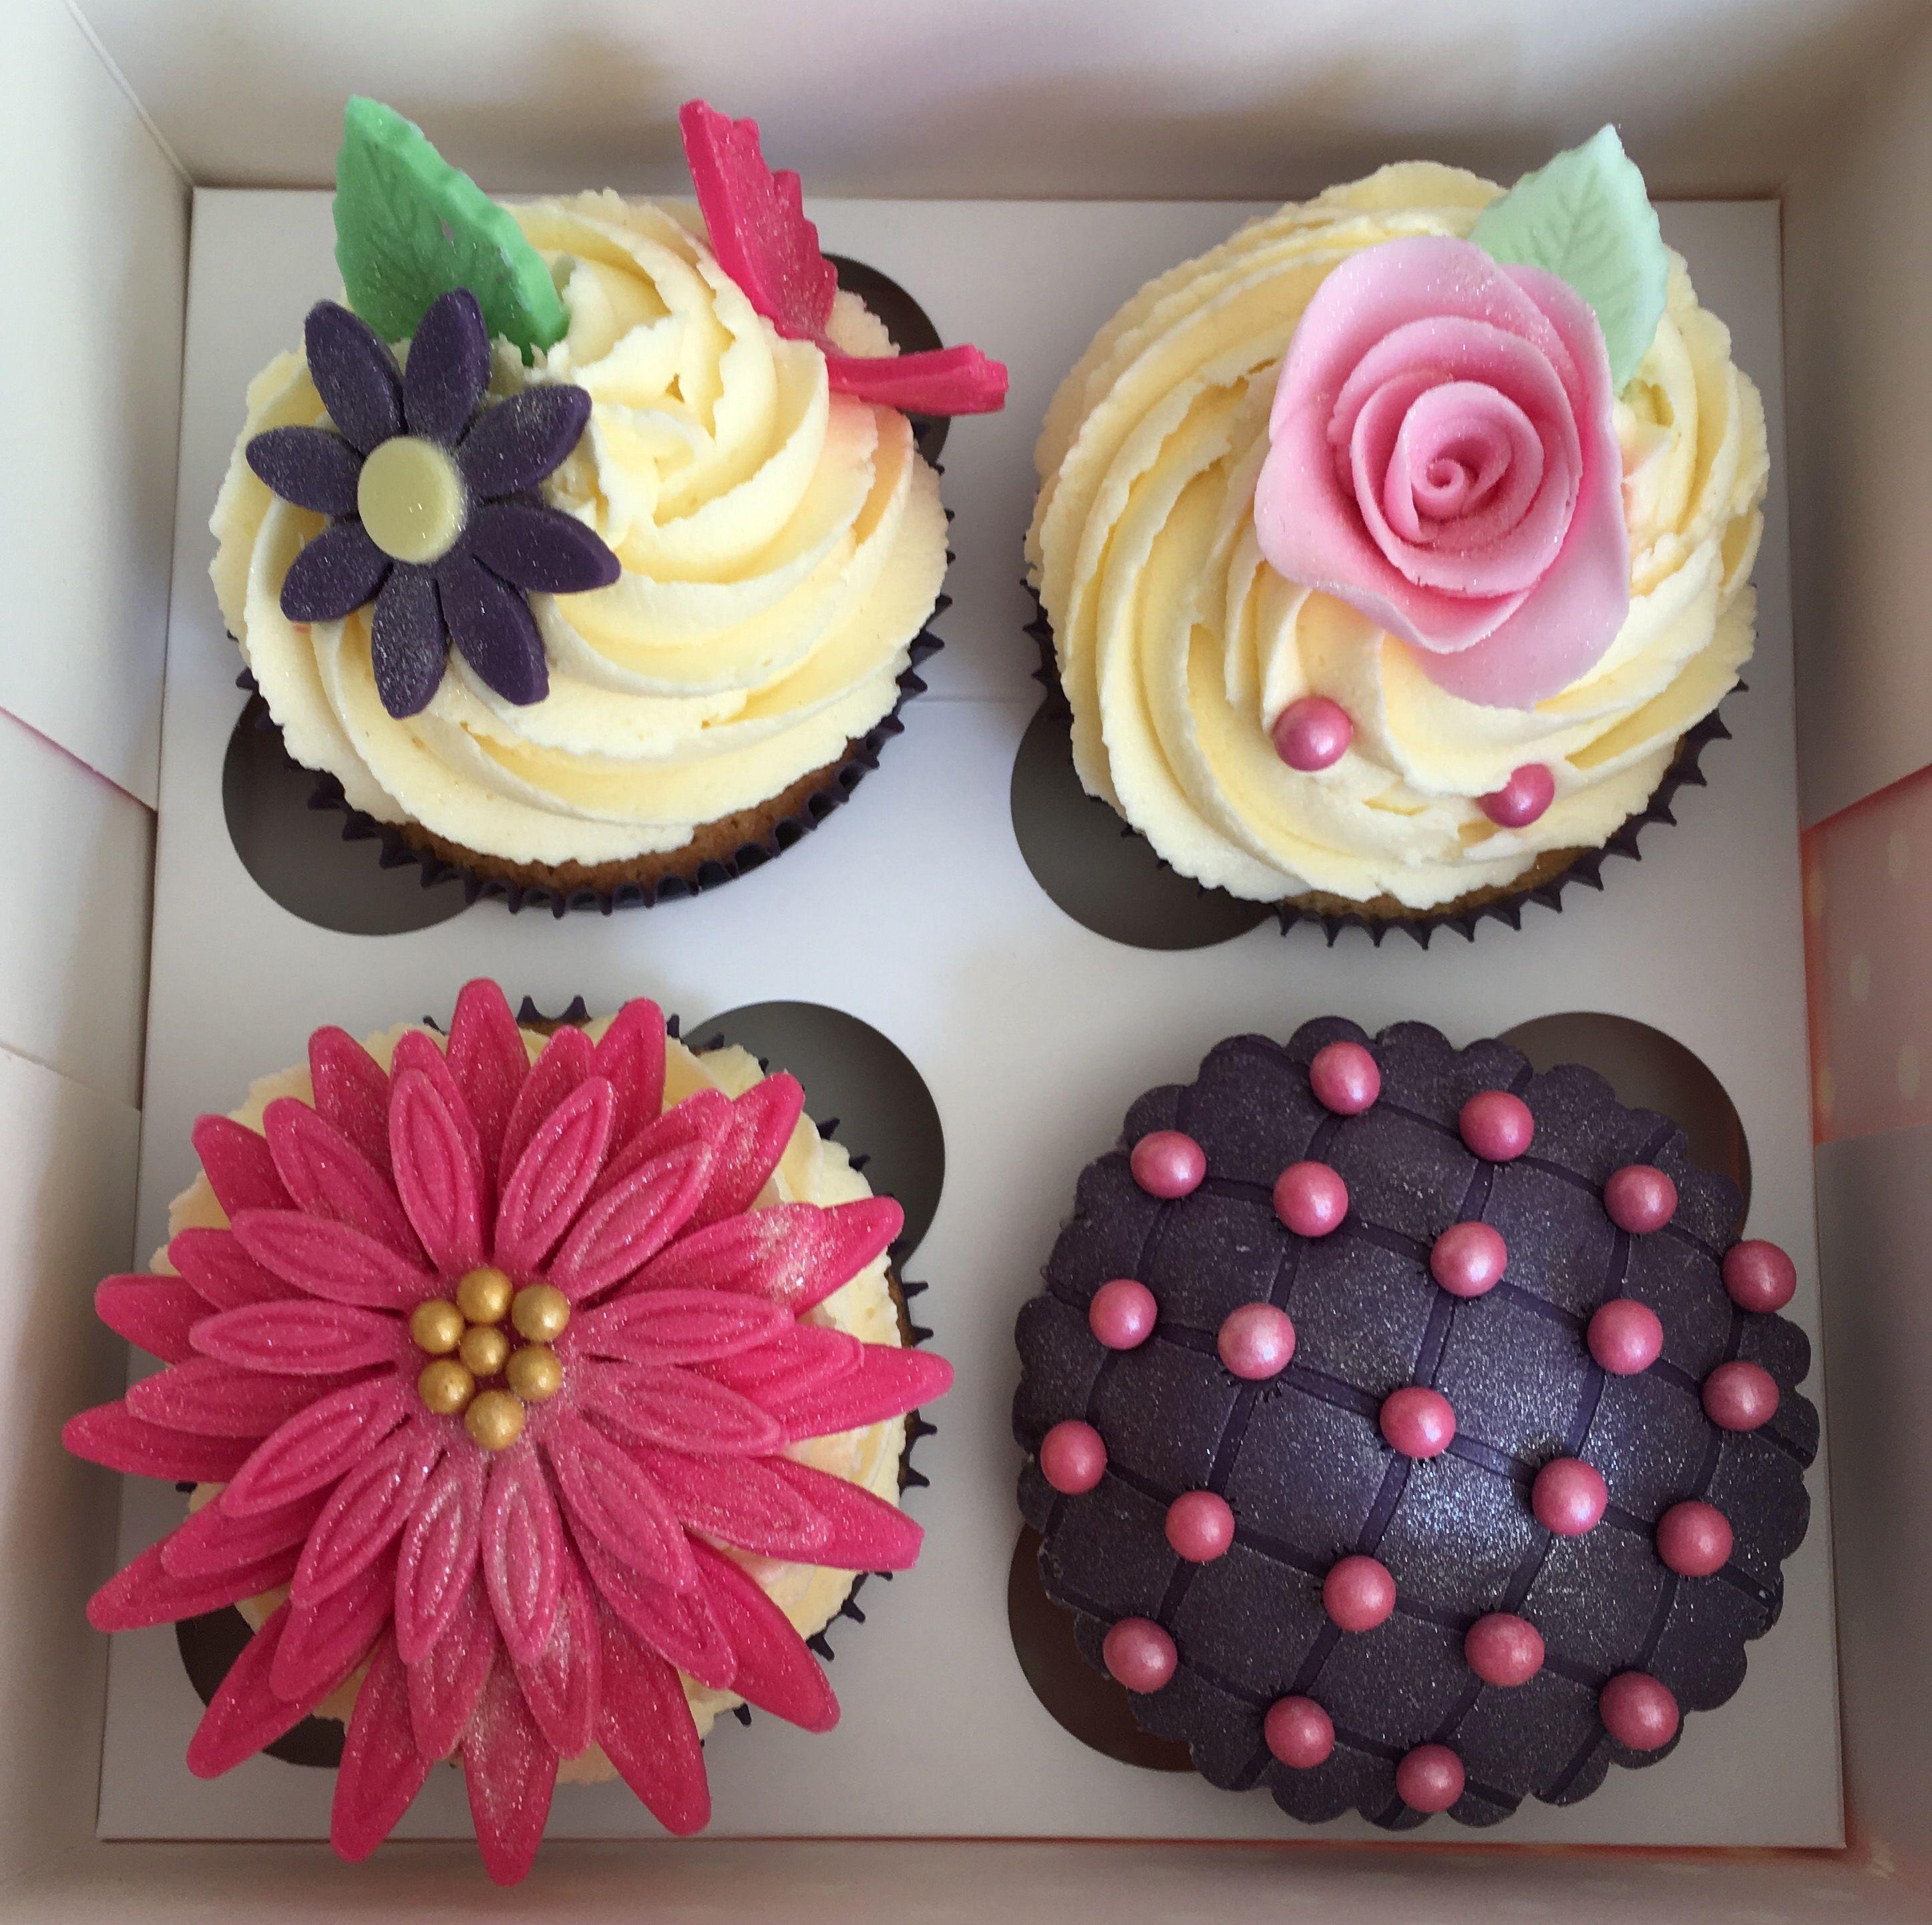 Pretty flower cupcakes for birthday or celebration craftycrusty pretty flower cupcakes for birthday or celebration izmirmasajfo